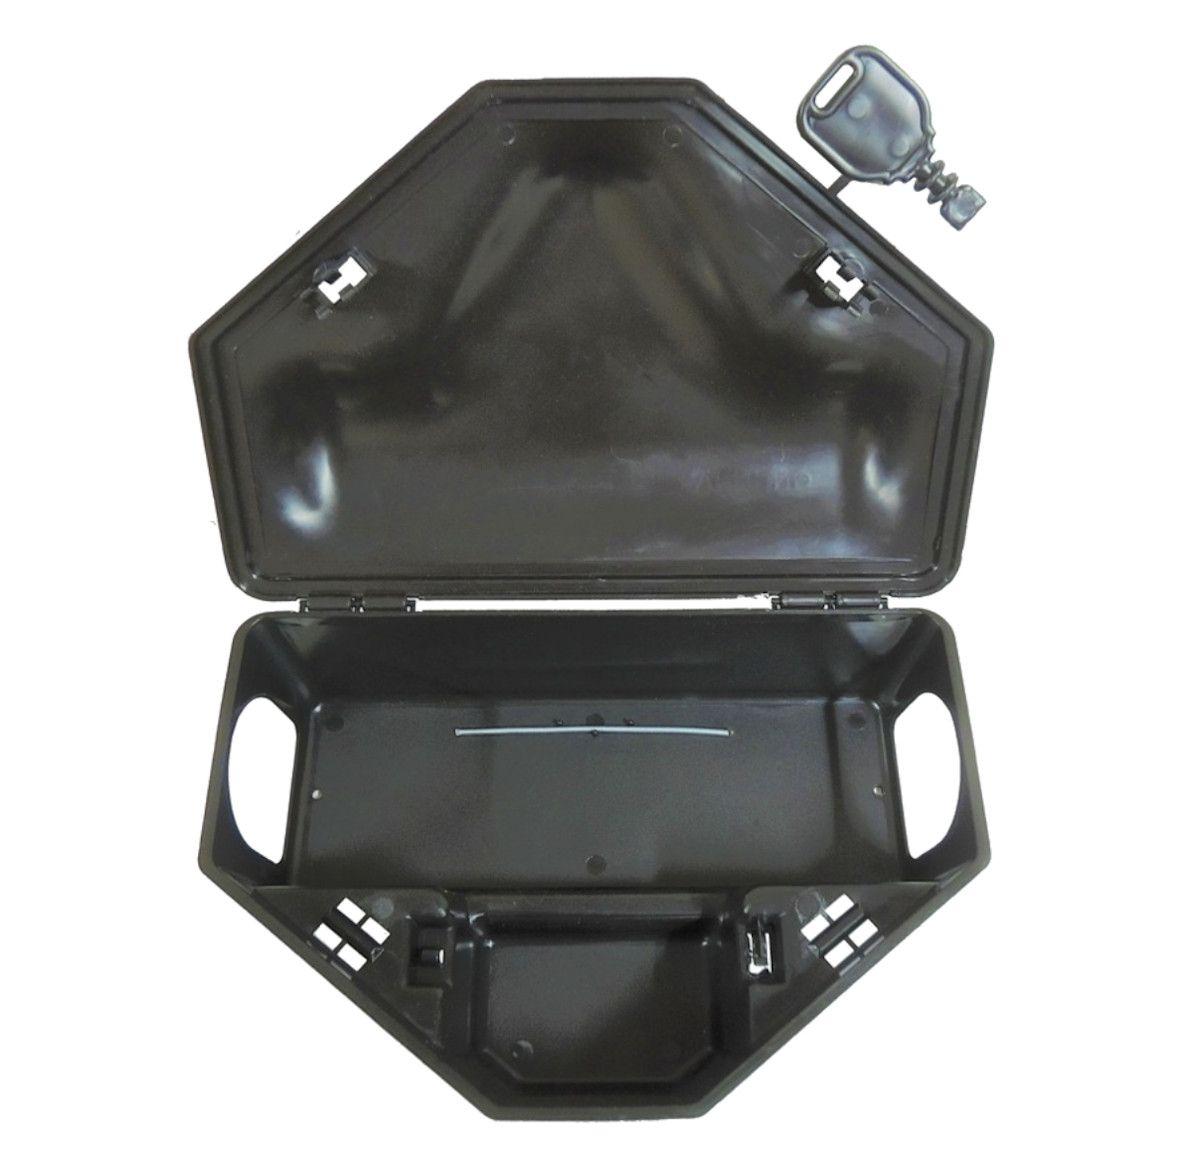 KIT 80 Porta Iscas Resistentes 2 TRAVAS c/ Chave Mata Ratos